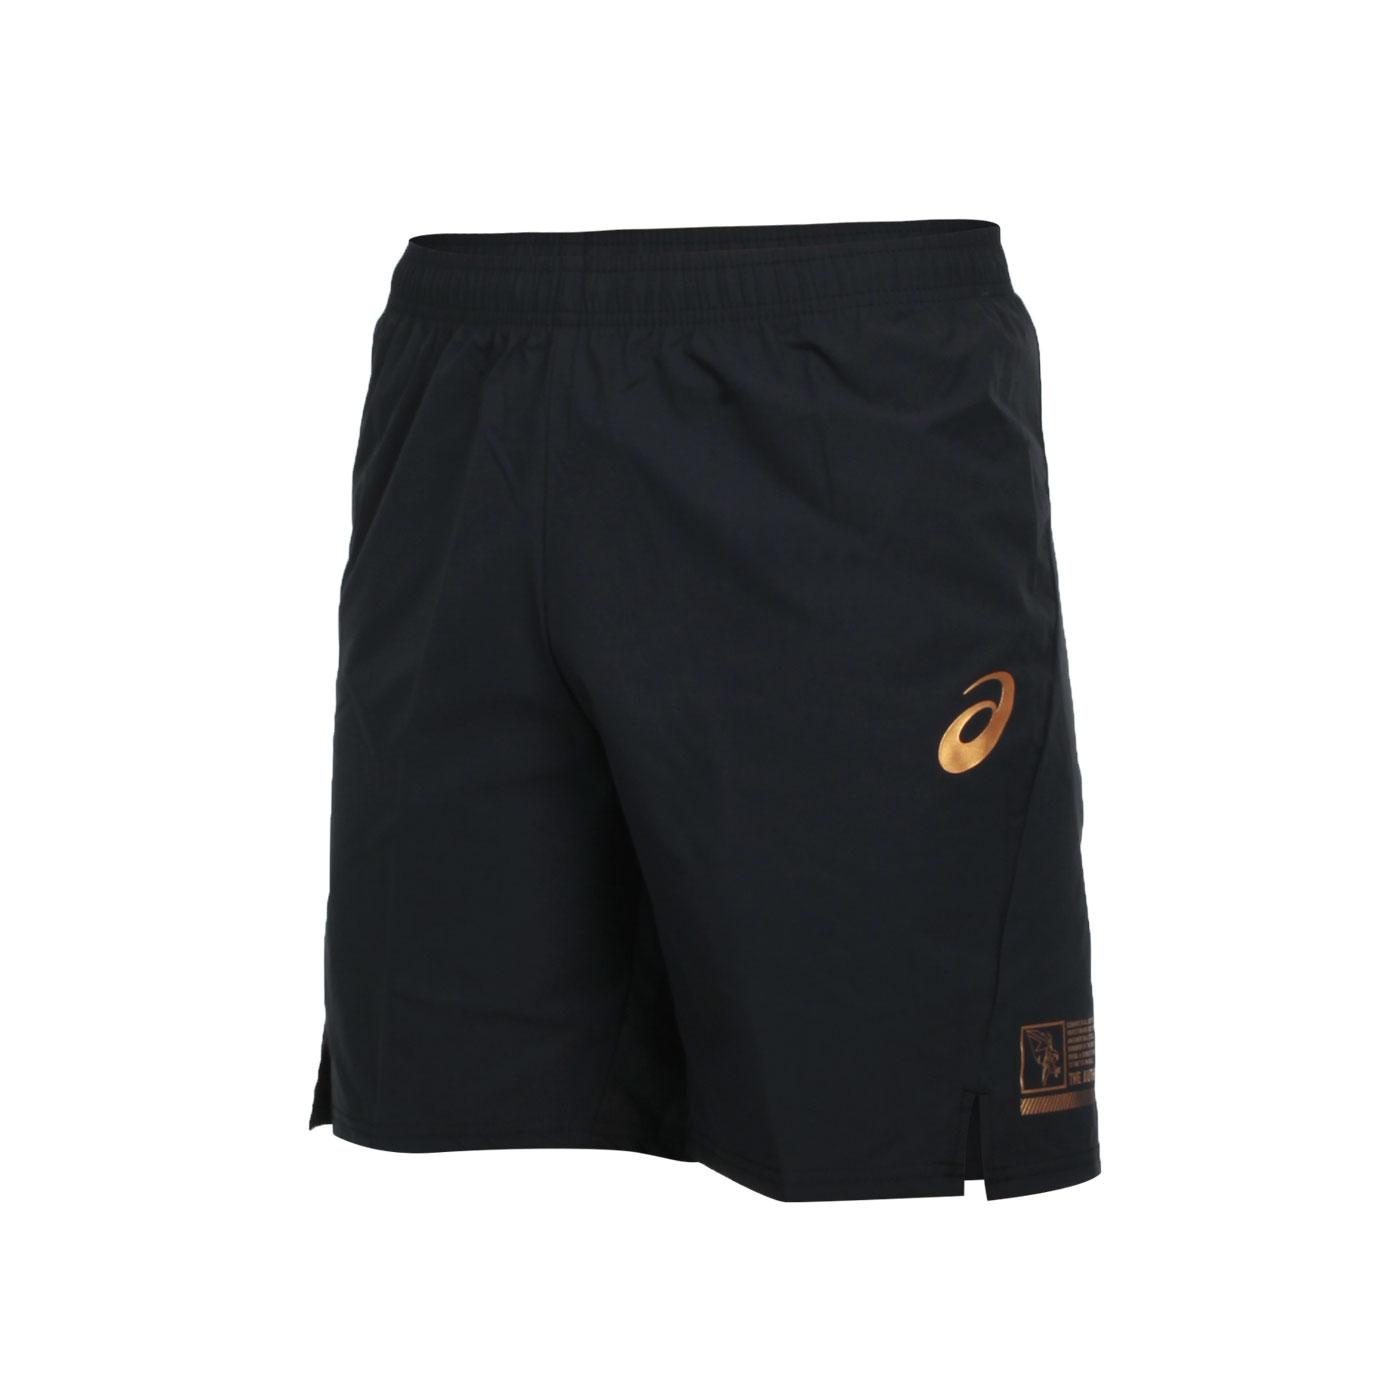 ASICS 男款排球短褲 2051A265-001